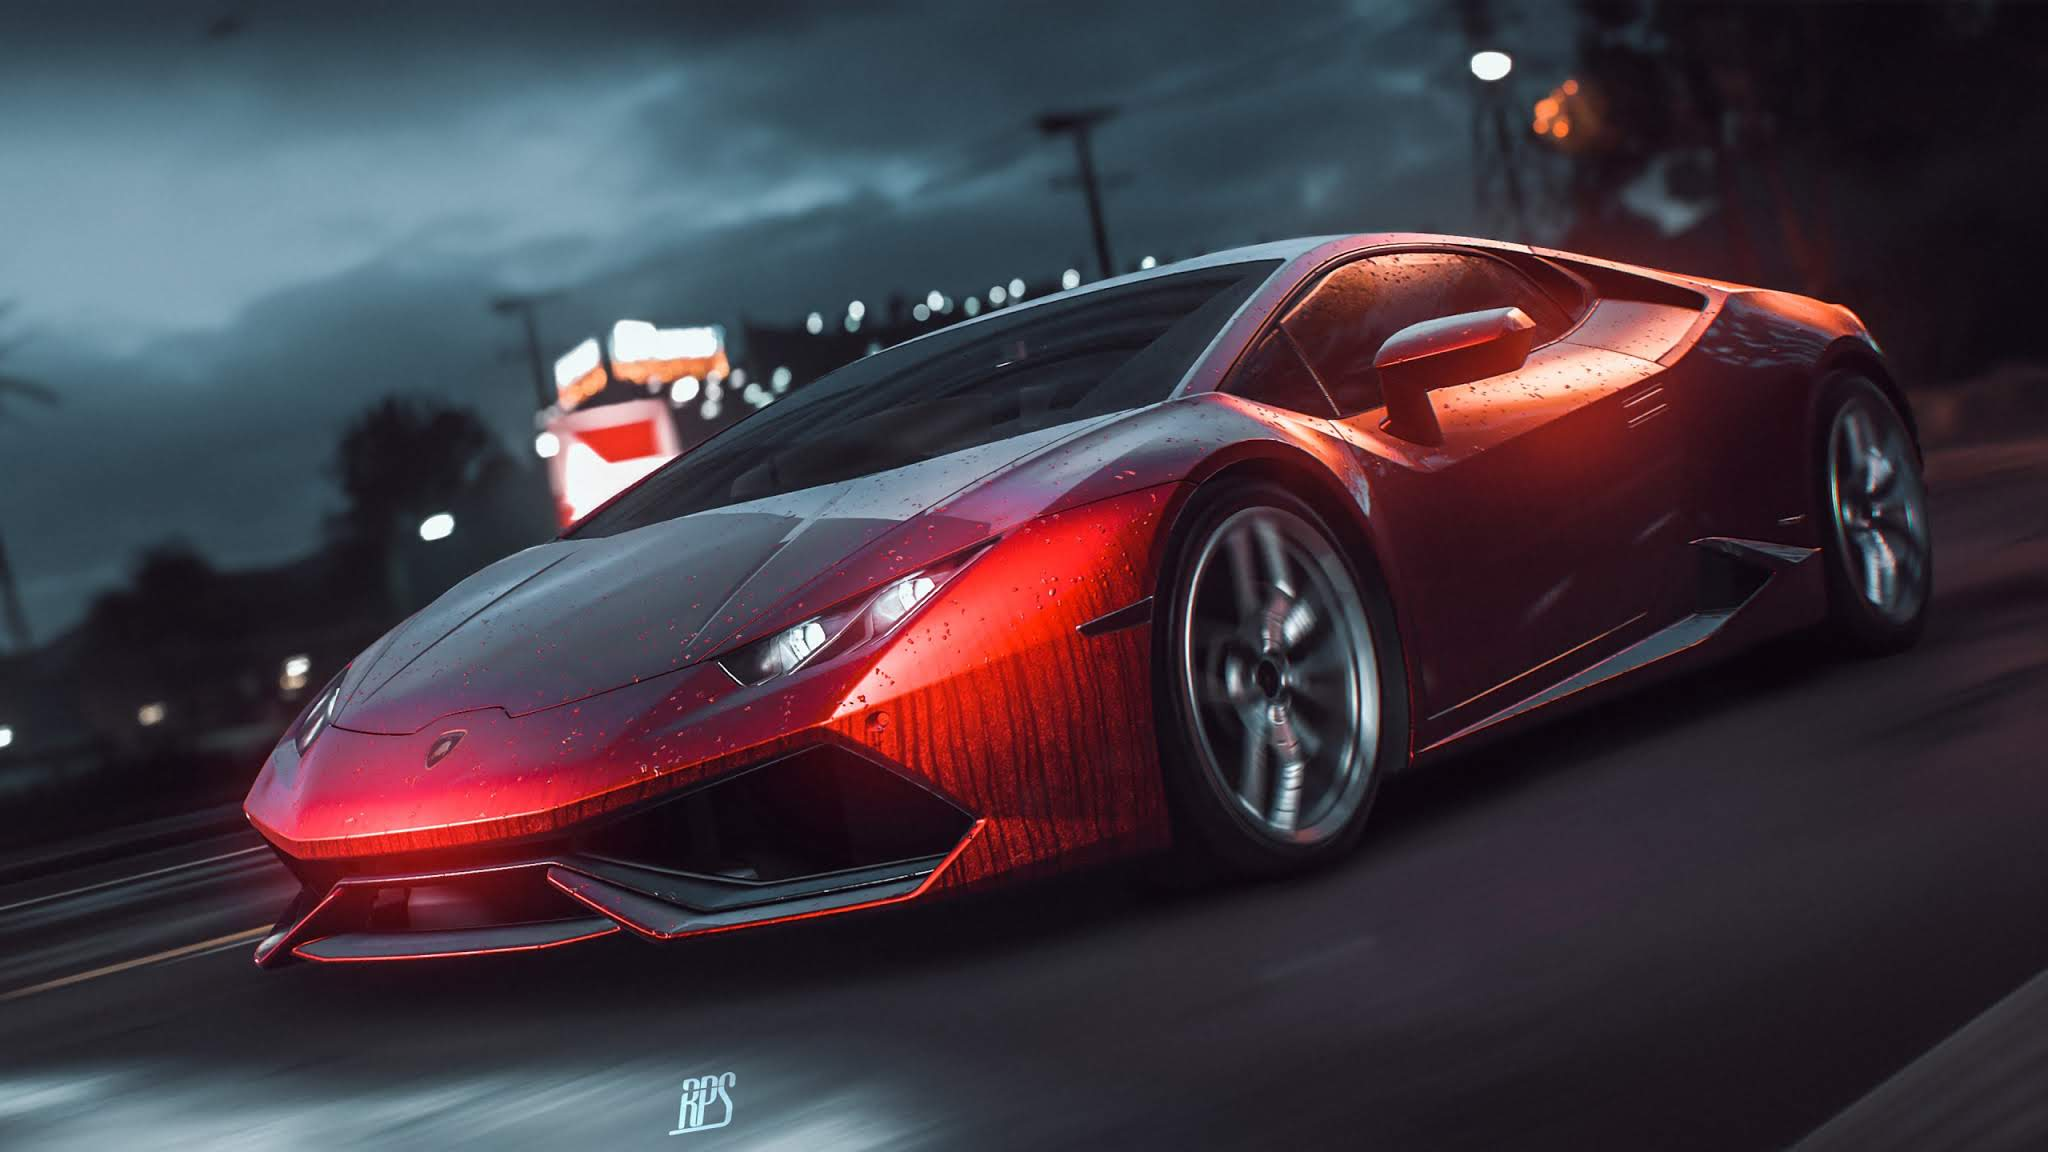 Lamborghini Need For Speed Wallpaper